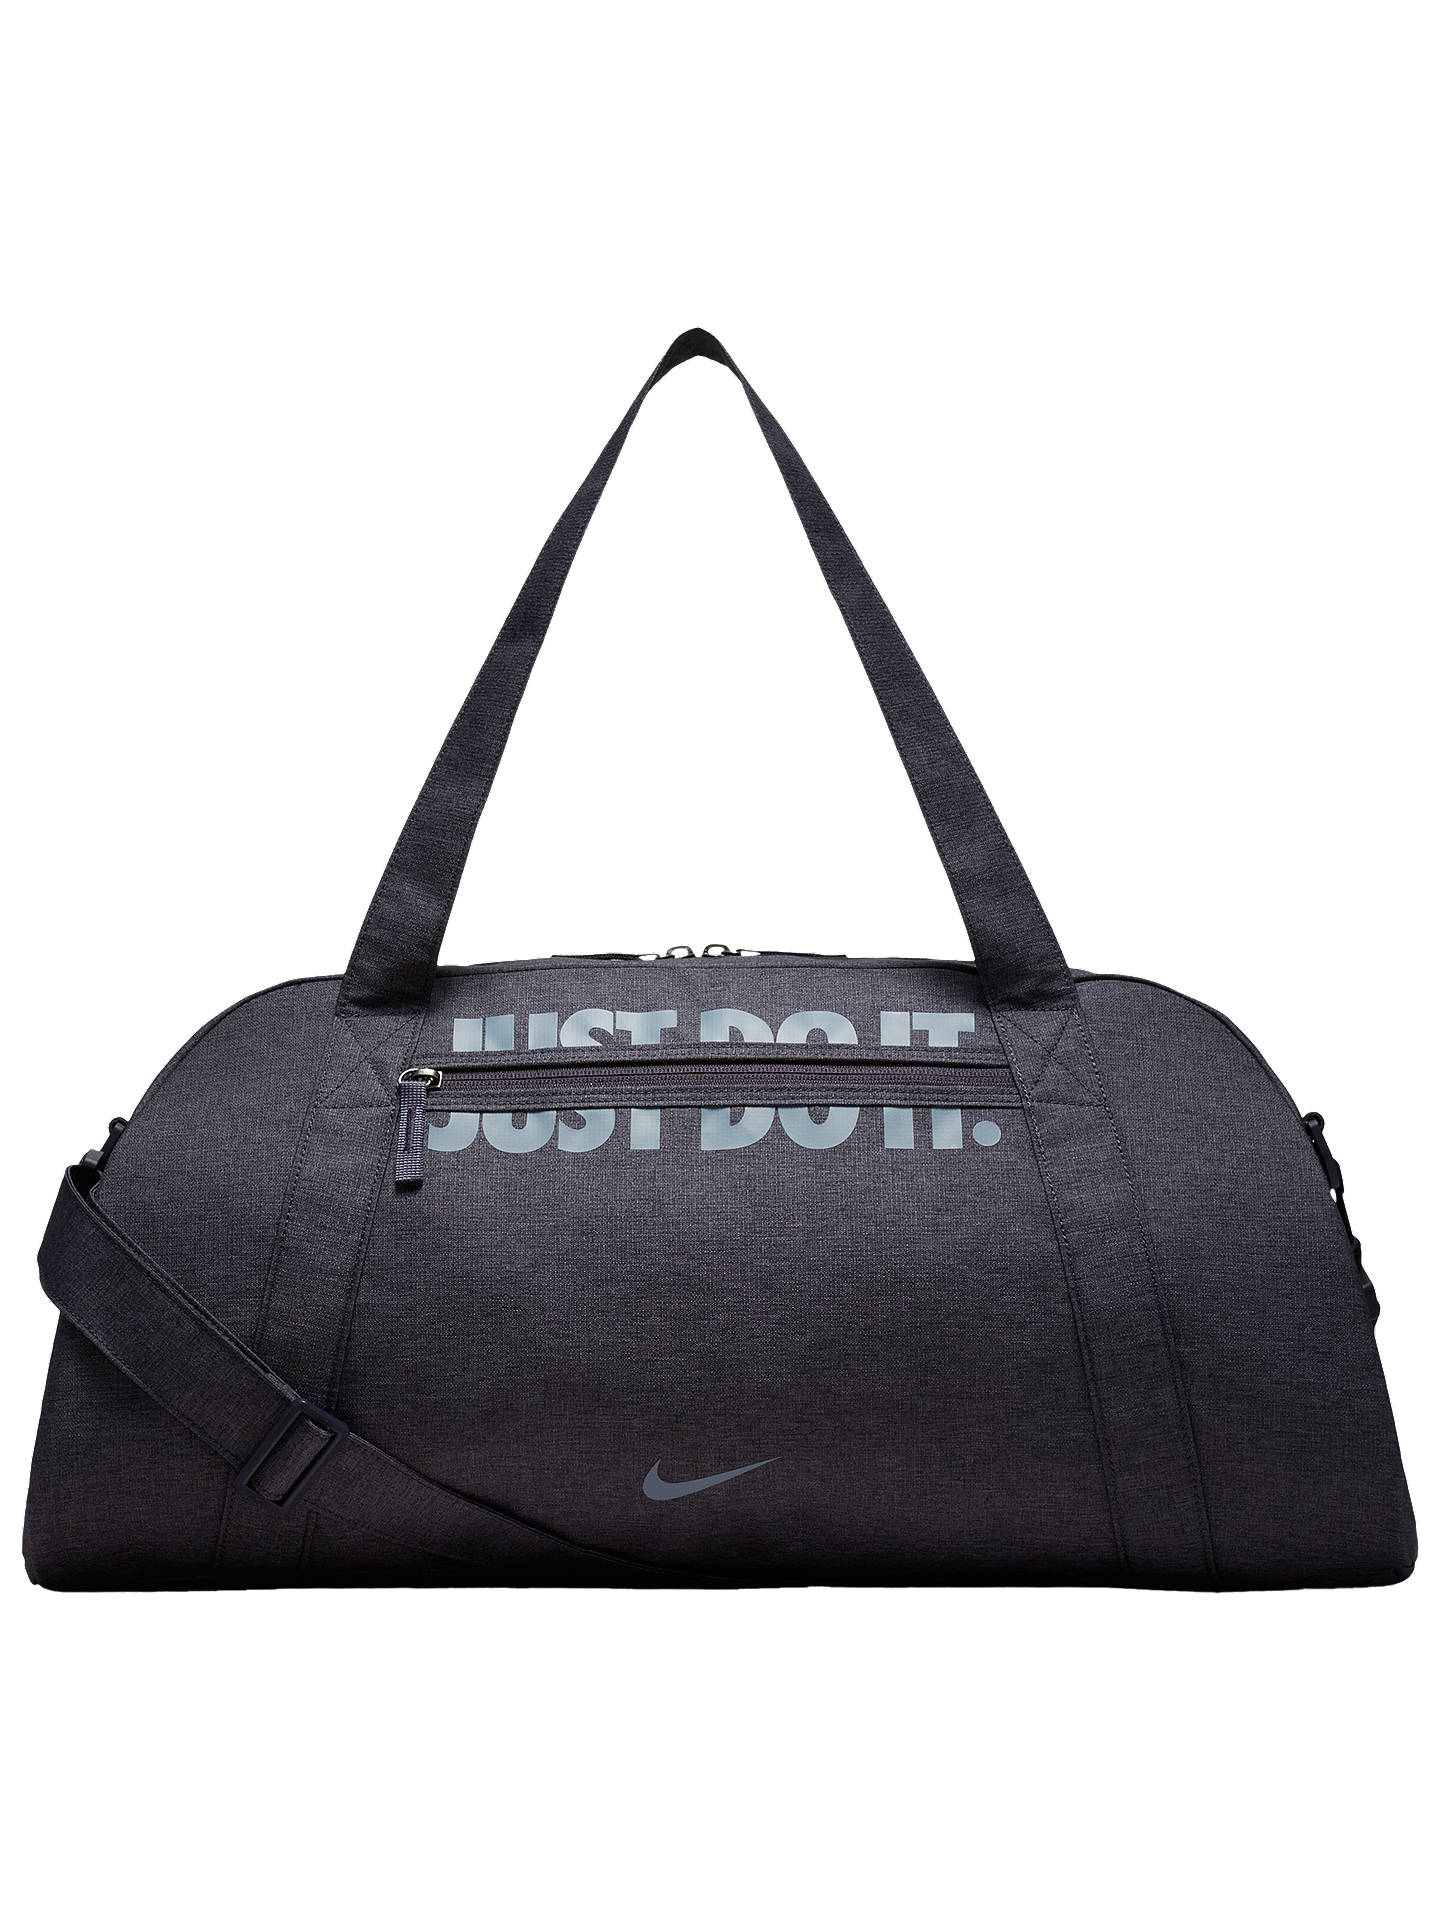 76f84516 Buy Nike Gym Club Training Duffel Bag, Gridiron/Ashen Slate Online at  johnlewis.